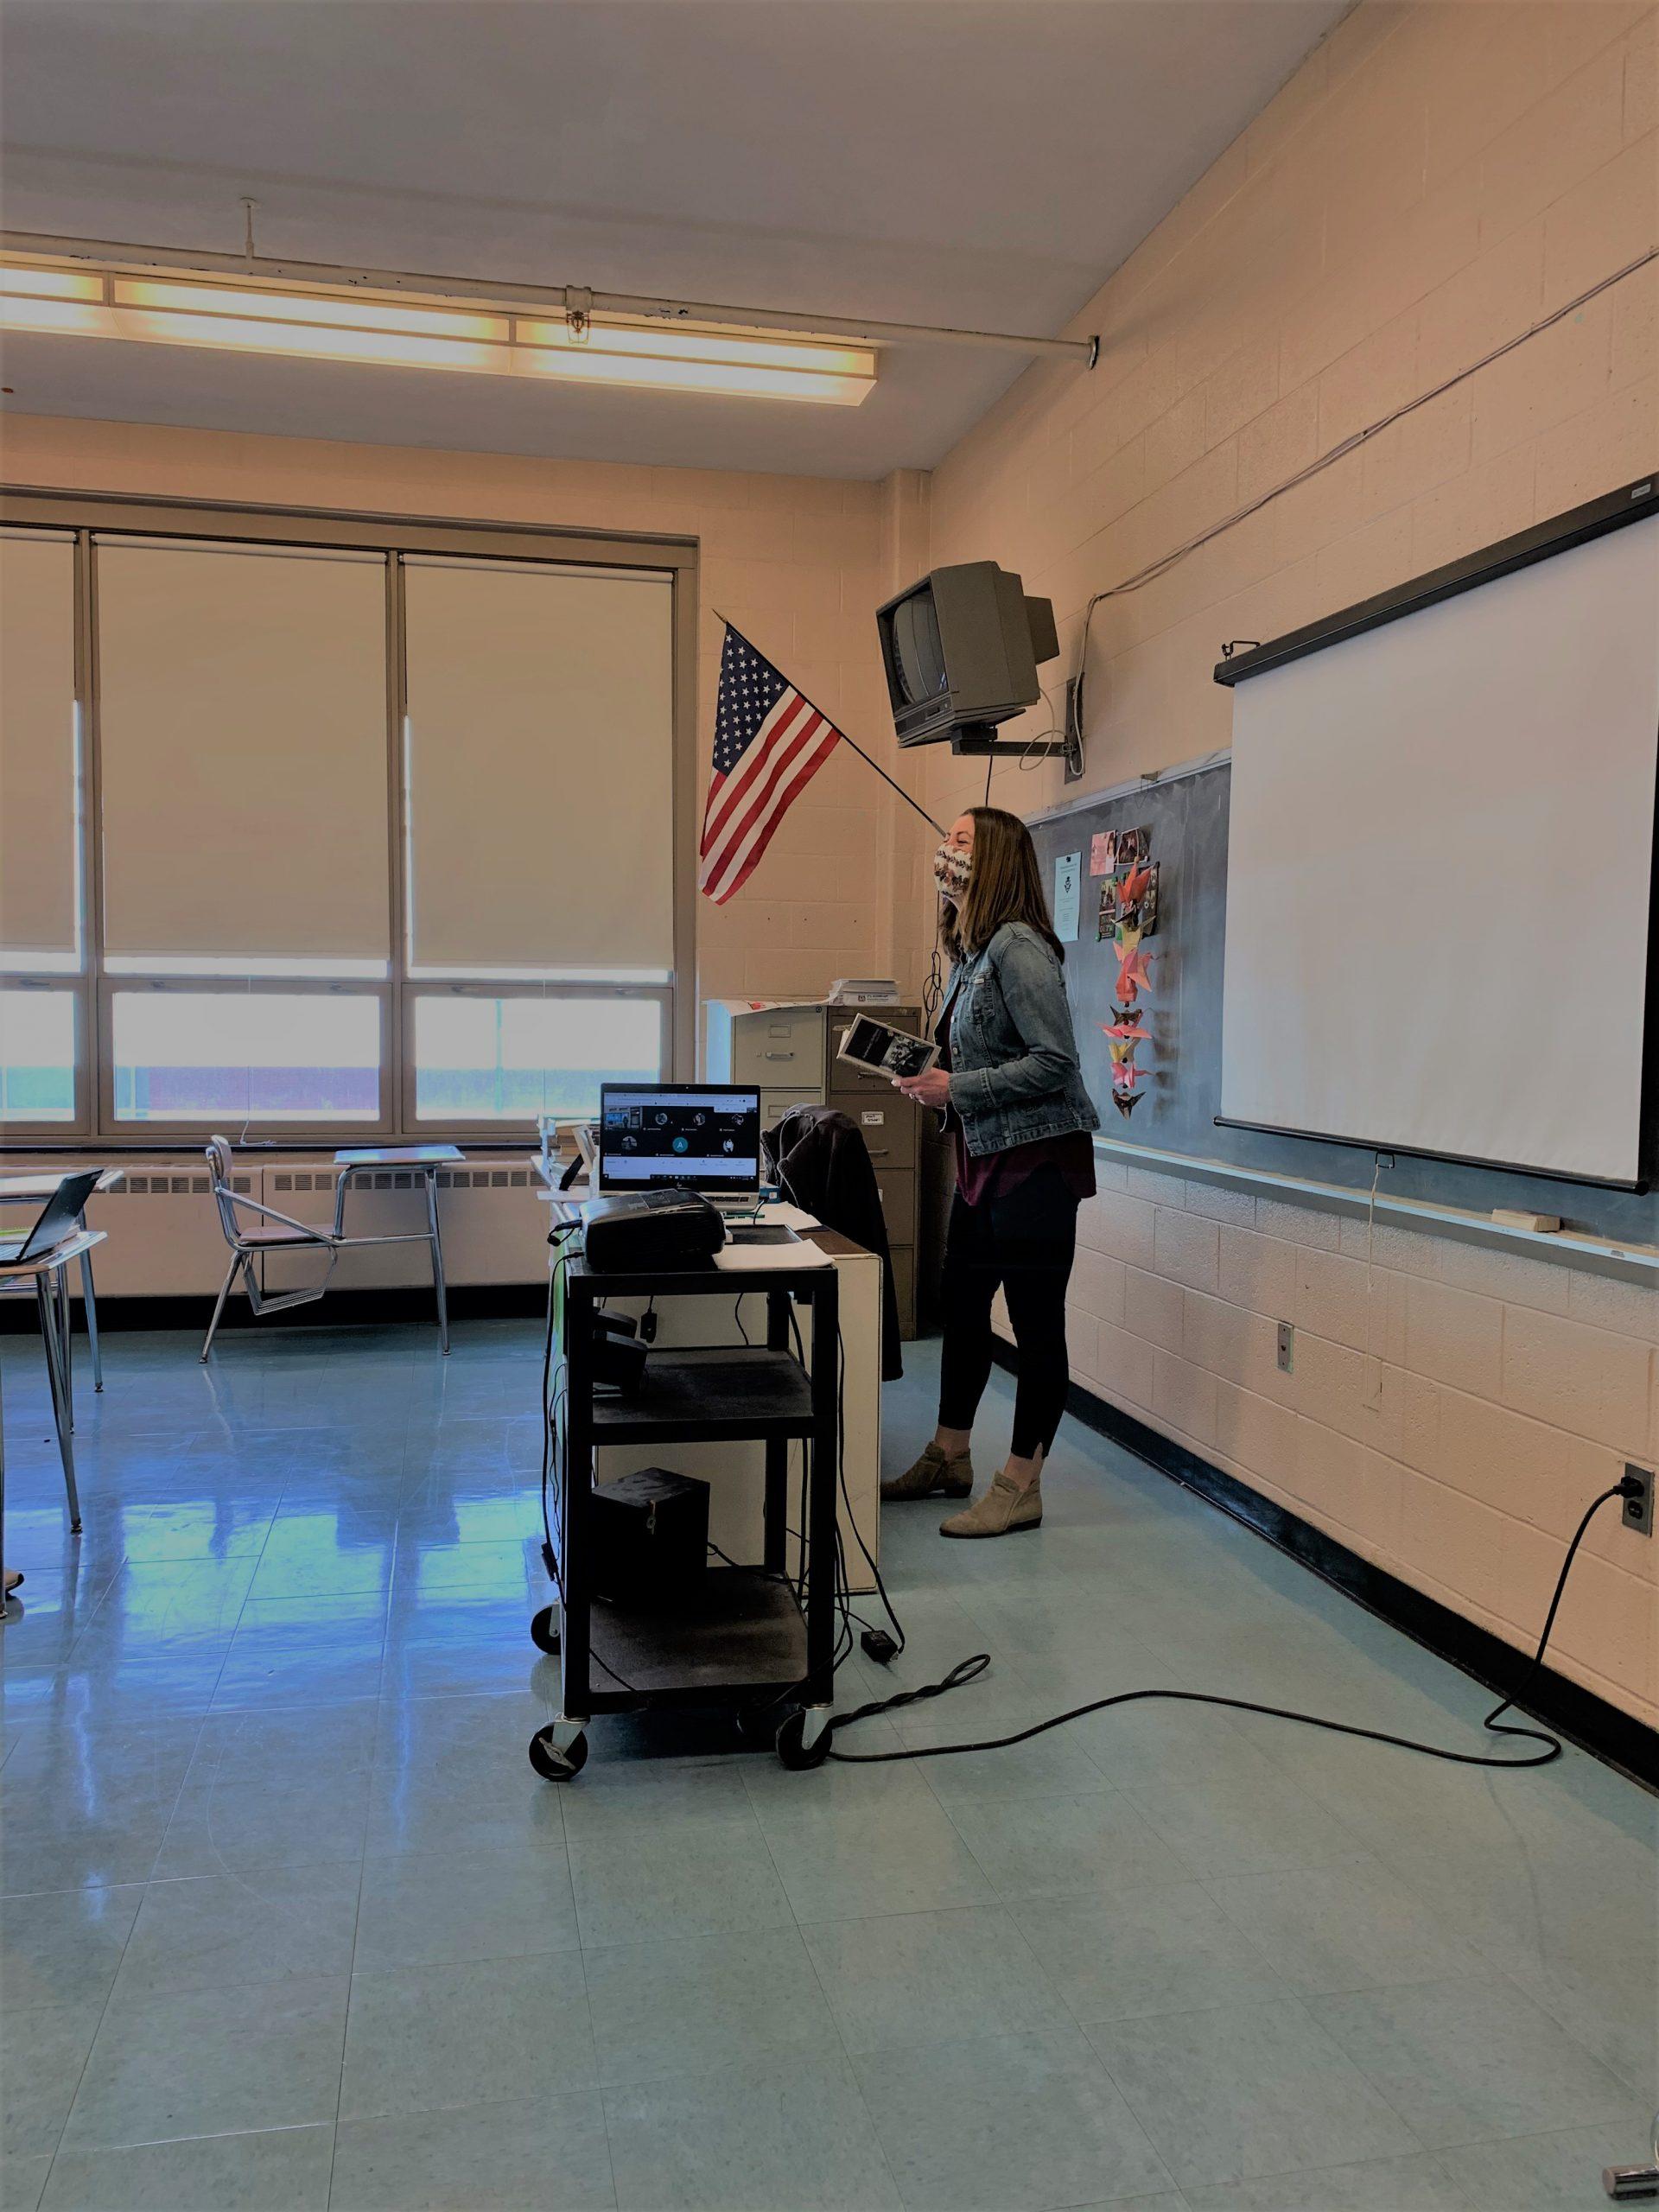 HS' McCauley re-ups UConn program